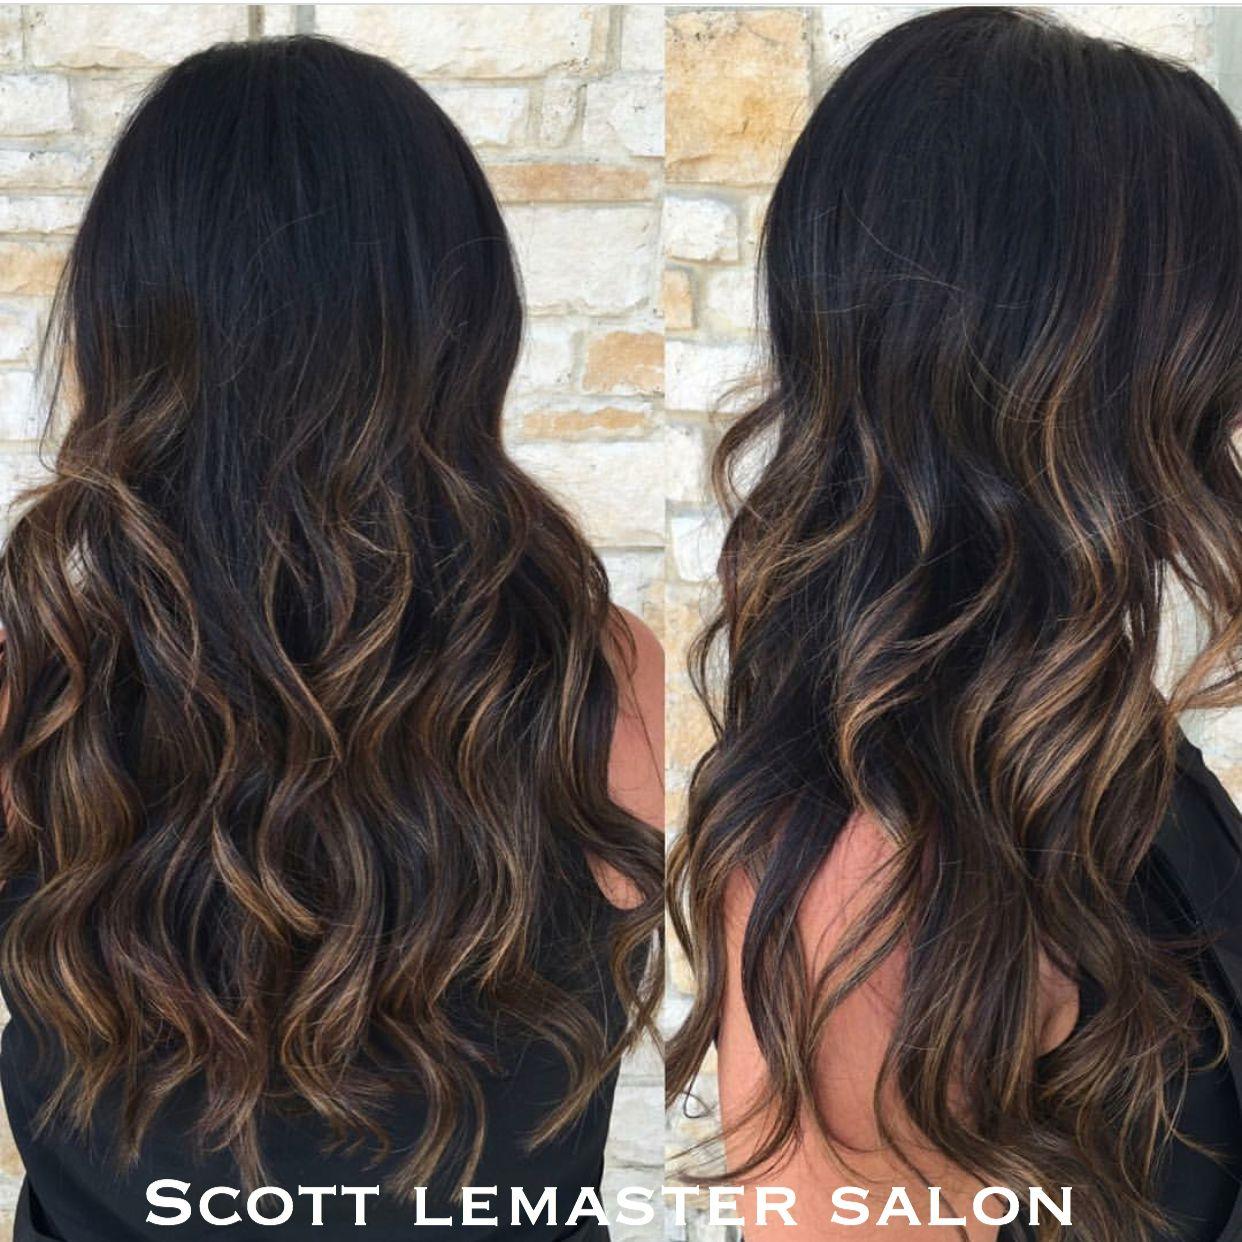 Cinderella Hair Extension Application Hair By Megan At Scott